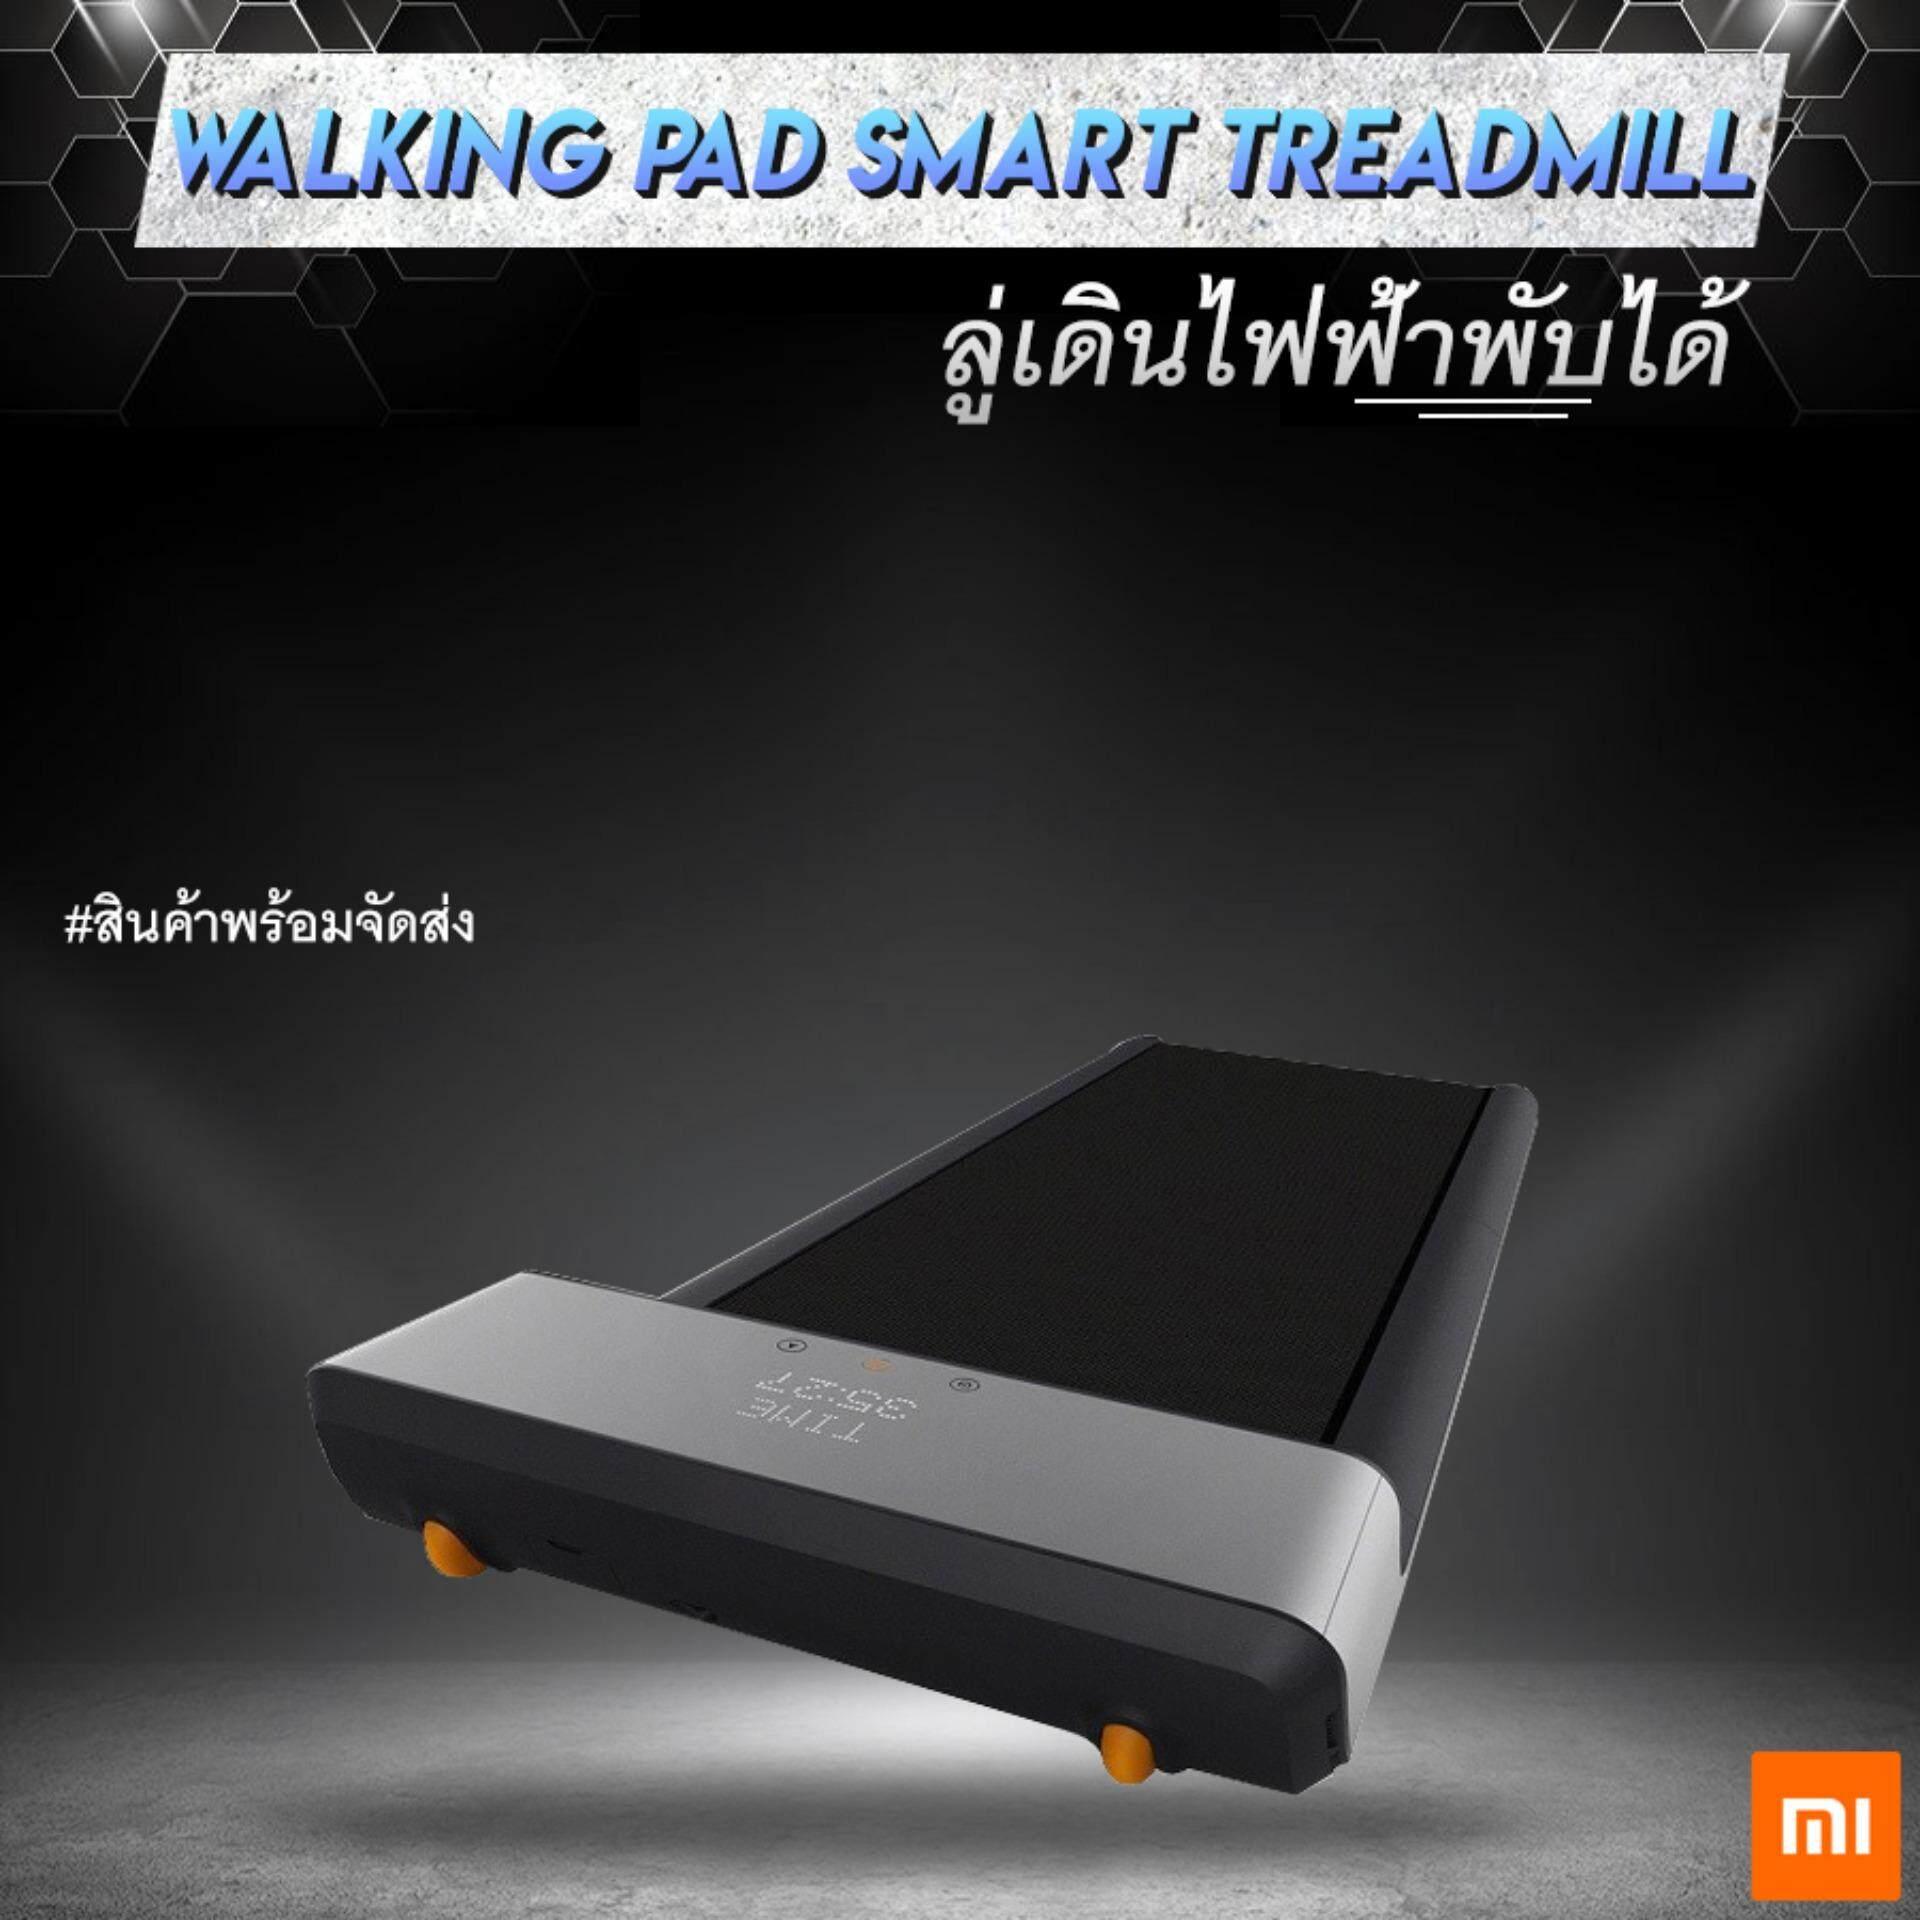 Xiaomi Walking Pad Smart Treadmill - ลู่เดินไฟฟ้า ควบคุมด้วยรีโมท พับเก็บได้ ประหยัดพื้นที่ (รับประกัน 1 เดือน )  - 56cbecd486977dc00296443954e69c5b - ลู่วิ่งไฟฟ้าราคาถูก